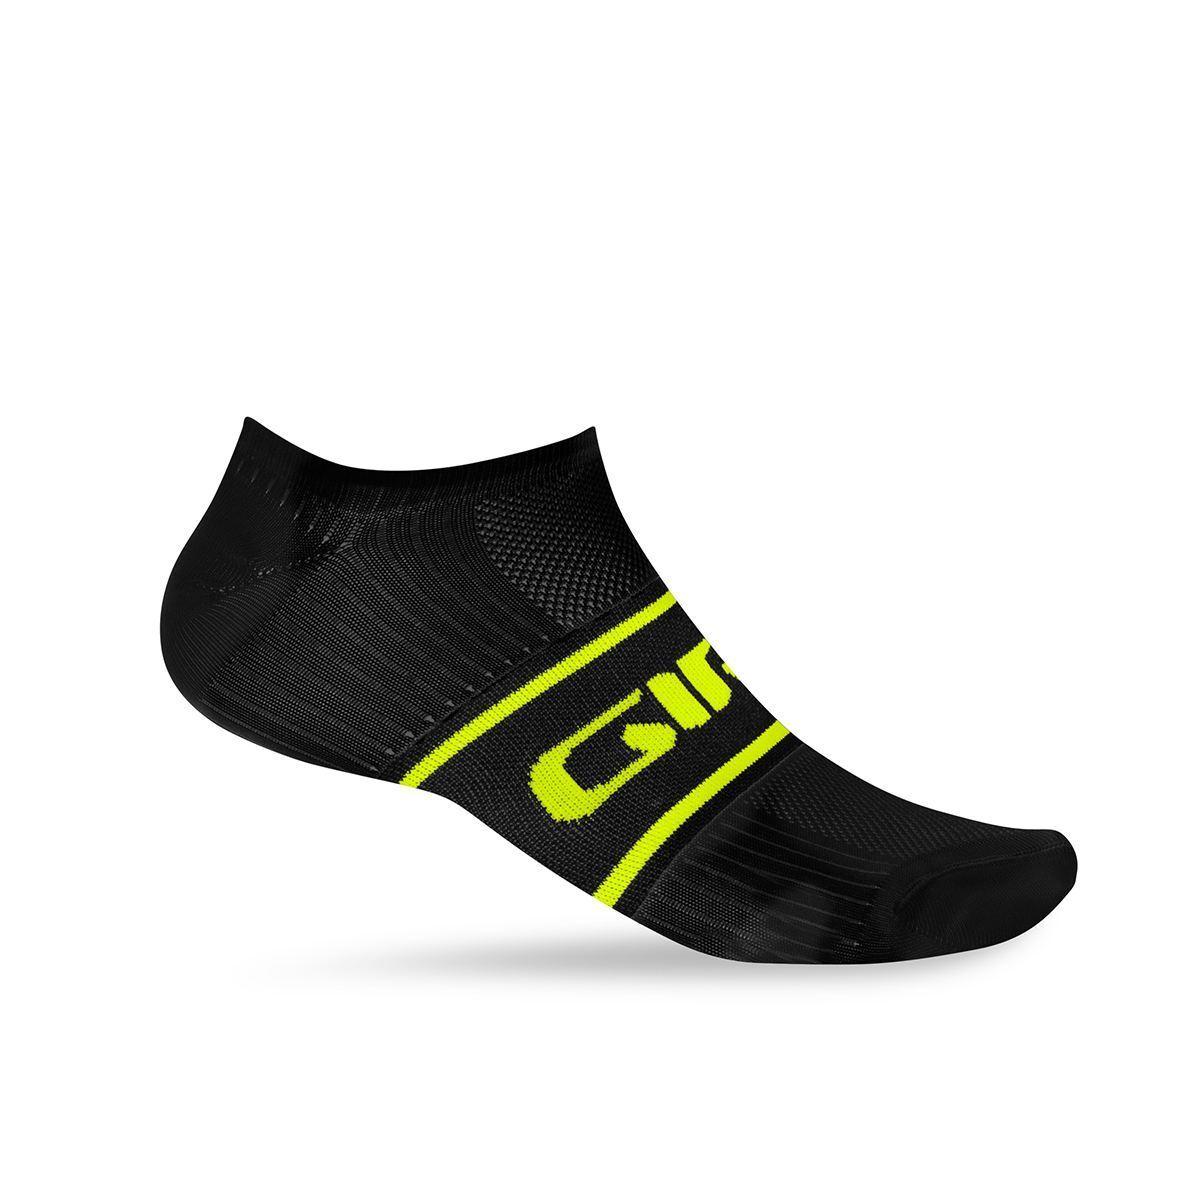 CYCLISME Socks Giro Comp Racer Low 2016 Noir/Blanc XL Thermique Thermique Thermique Shin Protection bc6f00